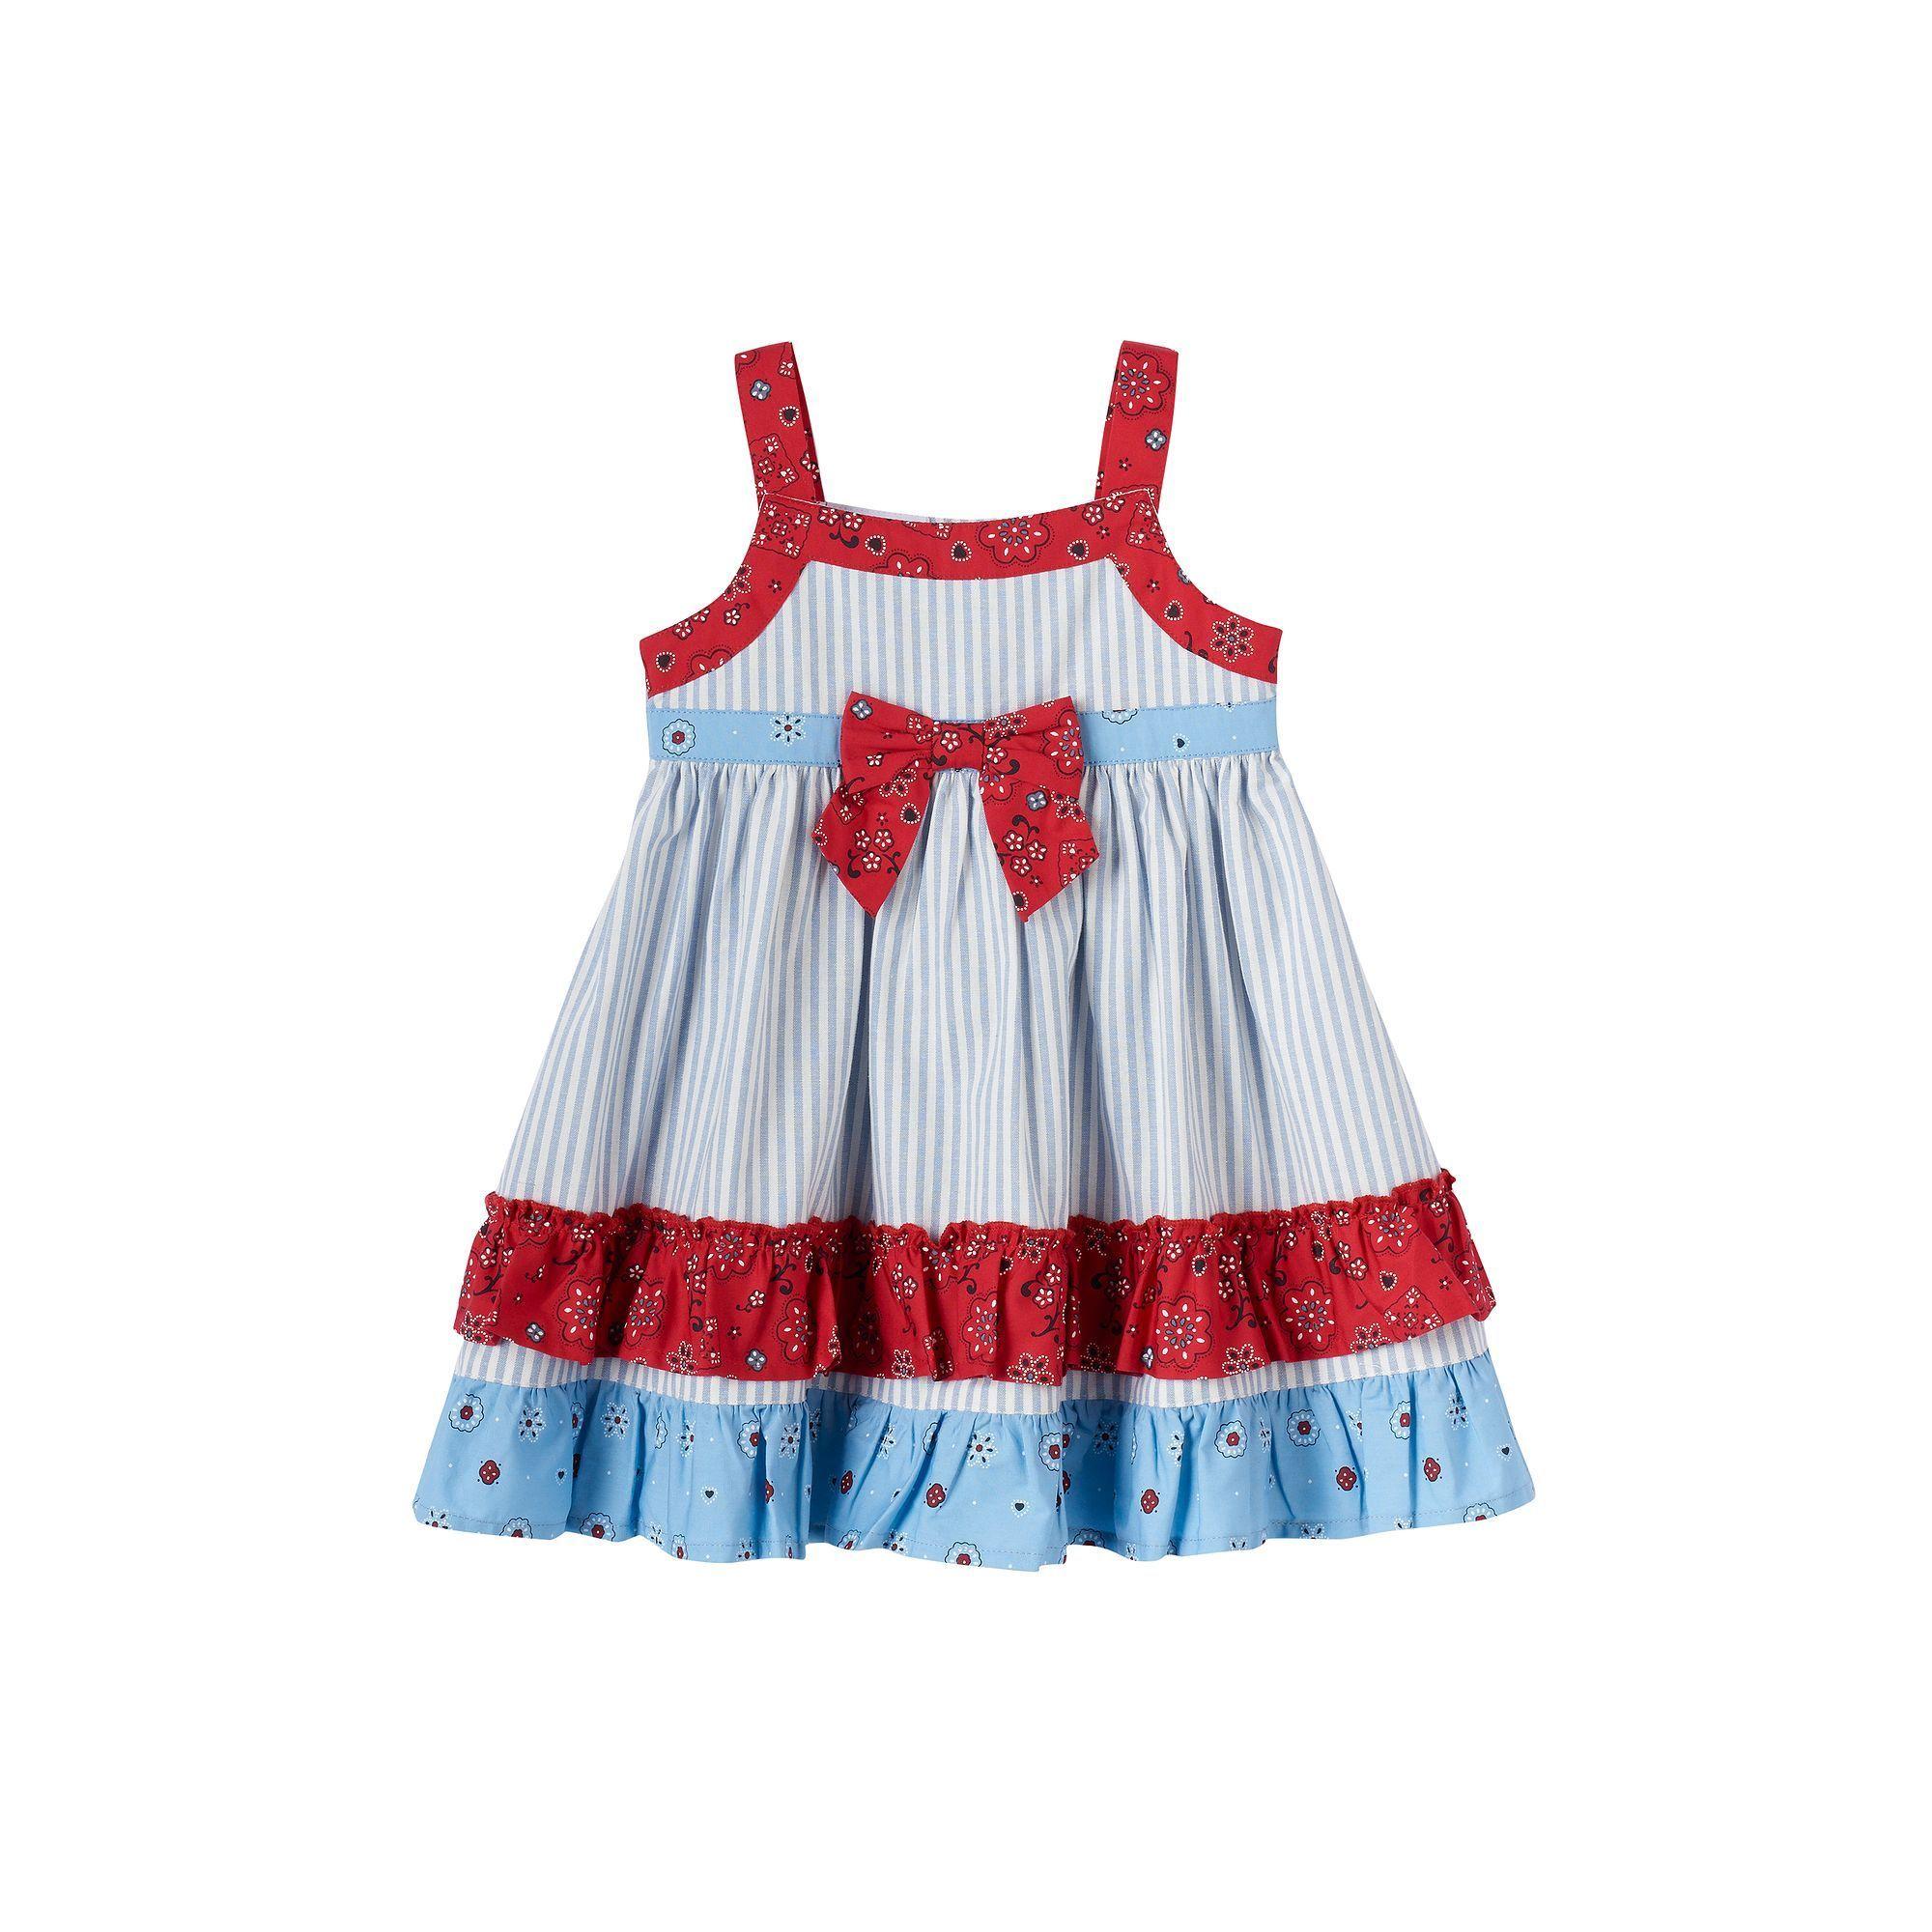 Baby Girl Blueberi Boulevard Patriotic Tiered Ruffle Dress Size 24